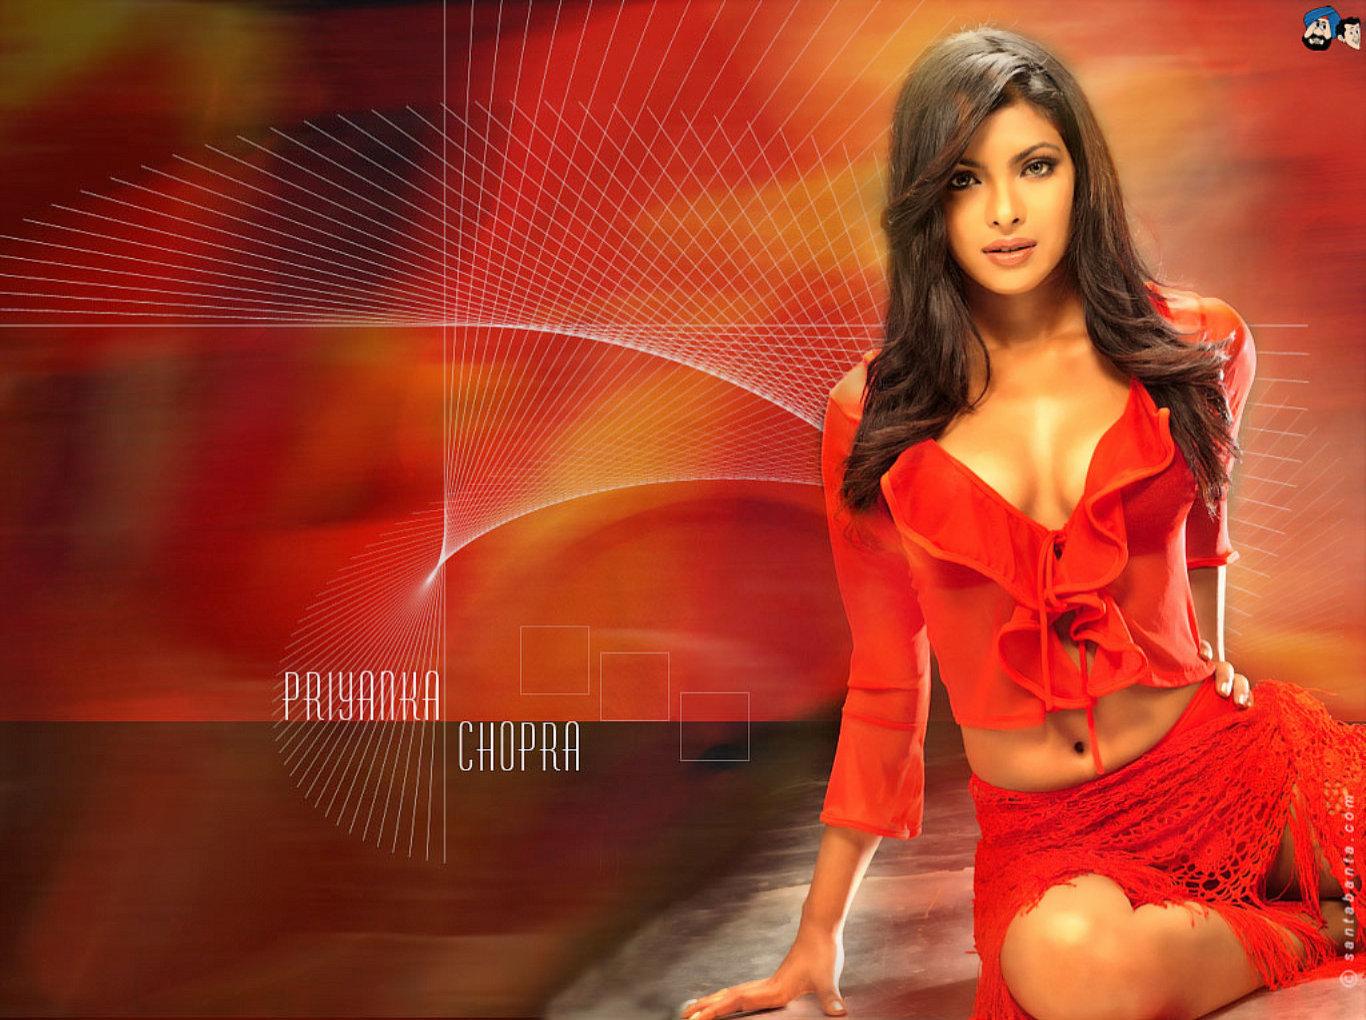 Priyanka Chopra Hot Red Dress Wallpaper